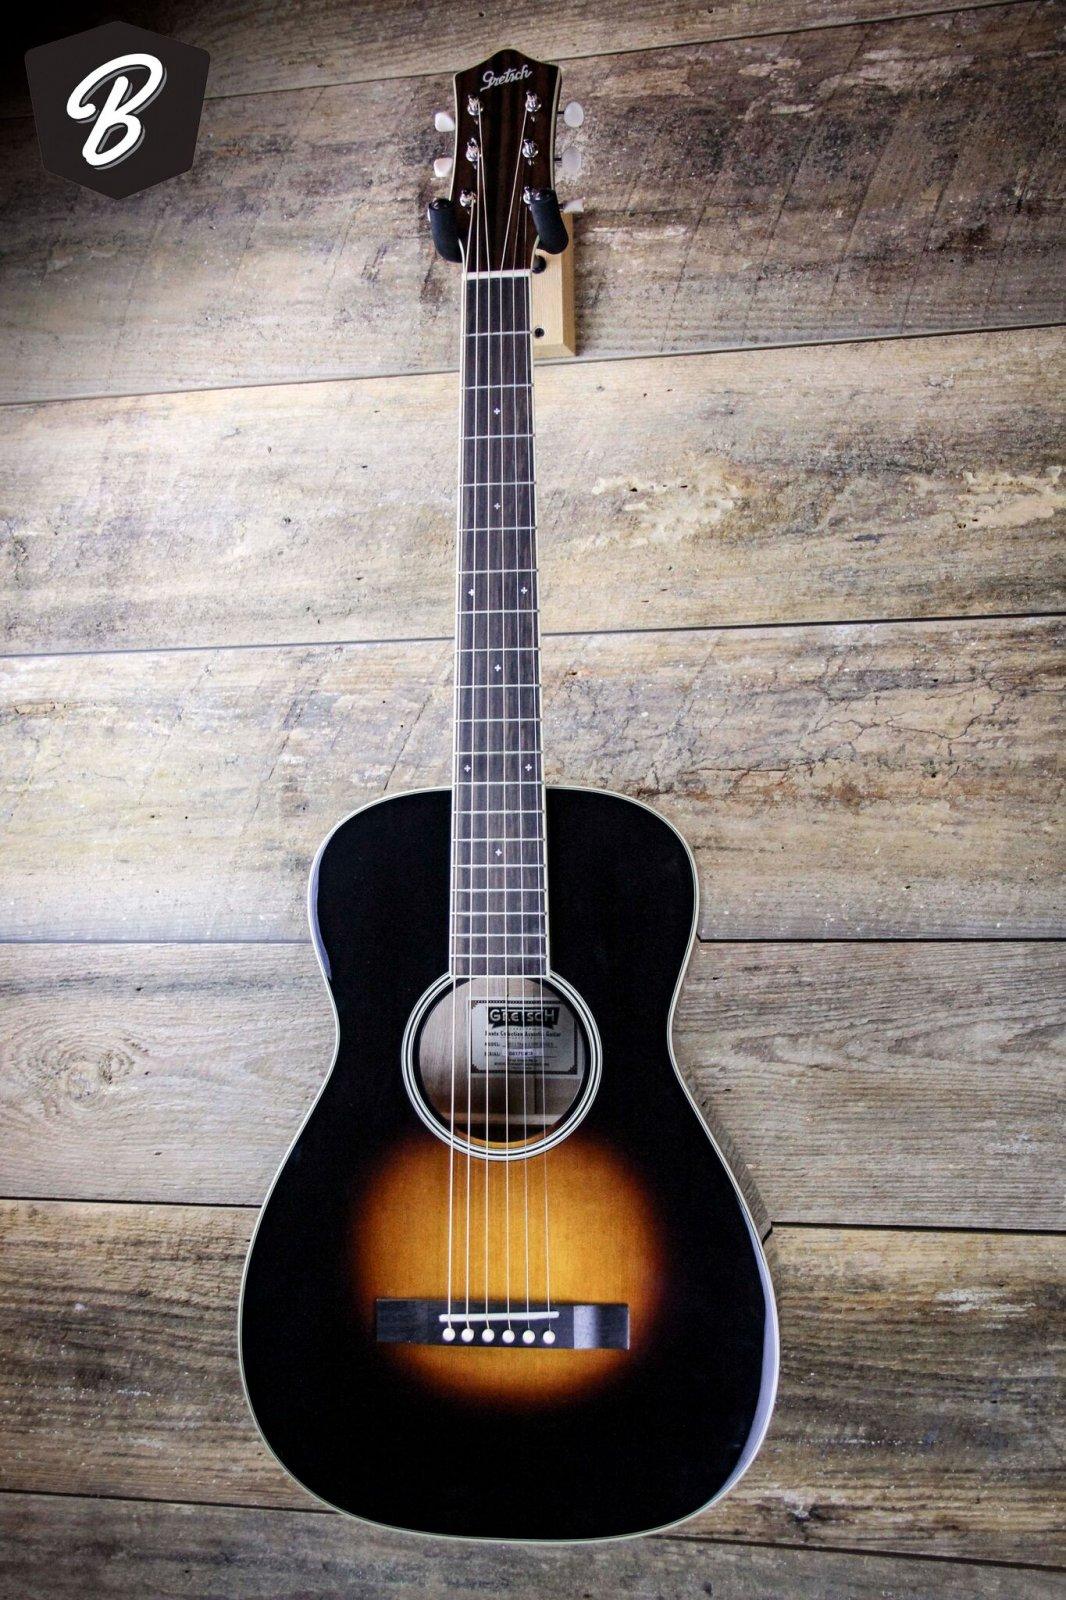 Gretsch G9511 Style 1 SPR SB GLS- Appalachian burst Parlor Guitar